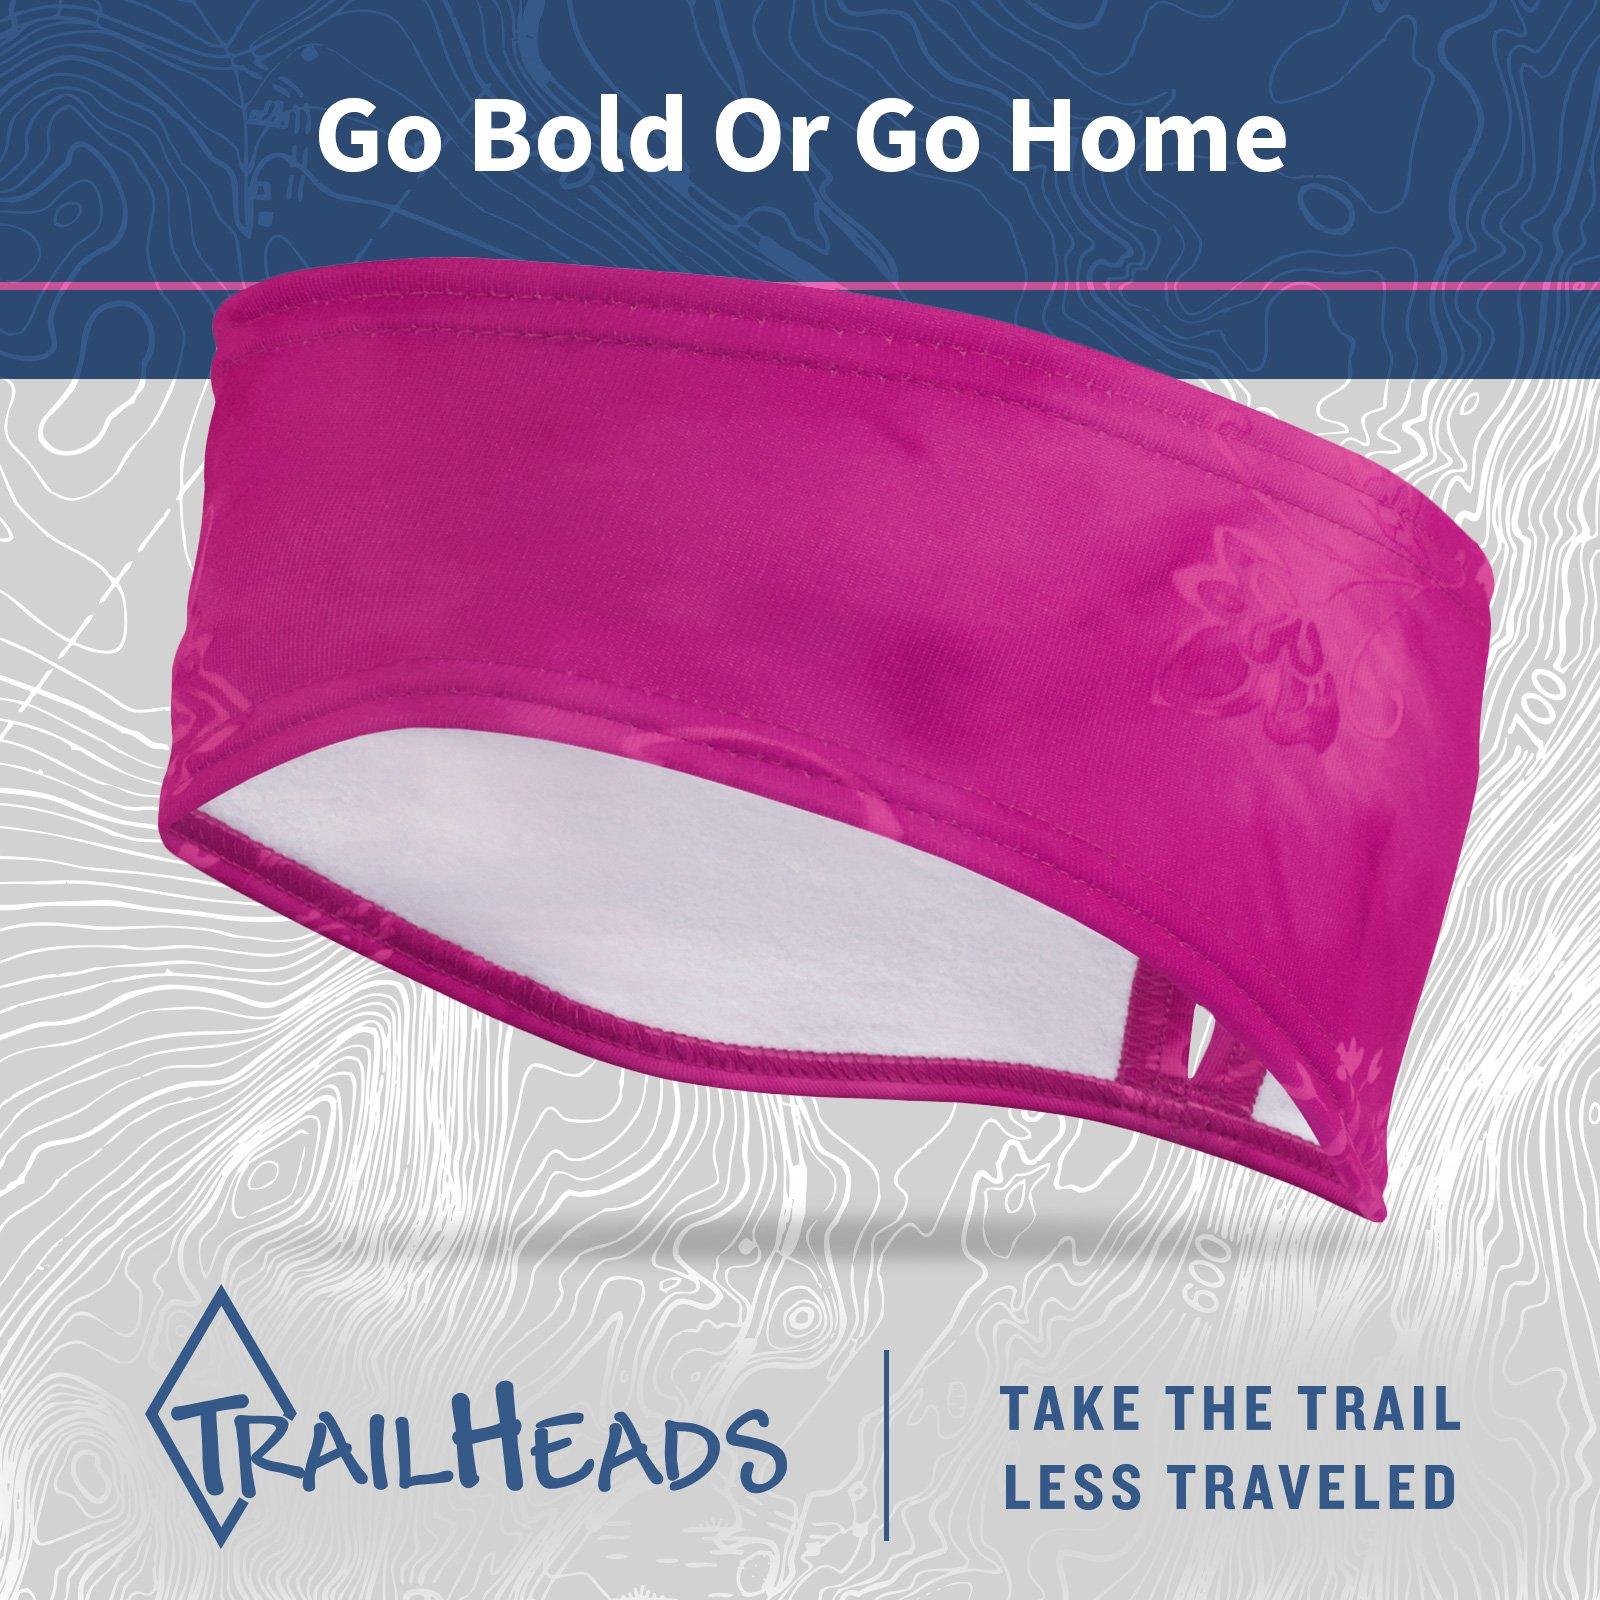 TrailHeads Women's Print Ponytail Headband – 12 prints - Made in USA - pink splash by TrailHeads (Image #6)